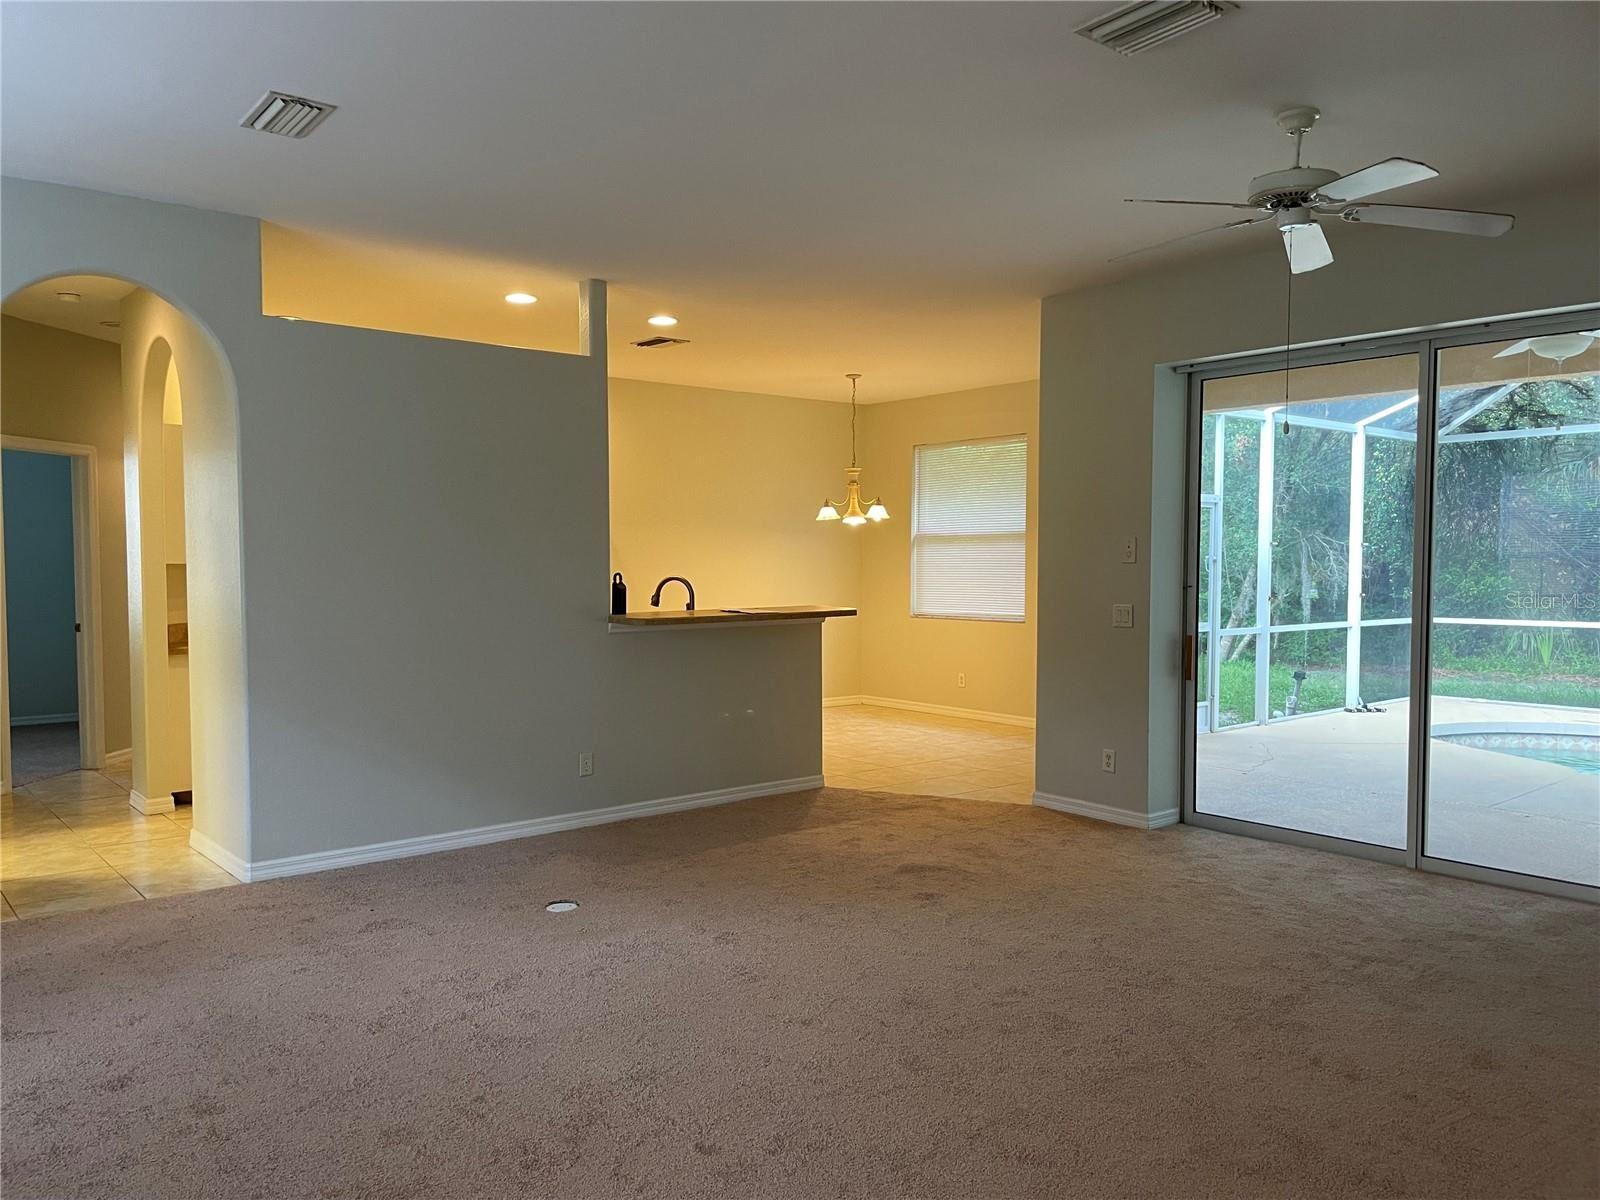 Photo of 4098 TWINBUSH TERRACE, NORTH PORT, FL 34286 (MLS # A4504000)